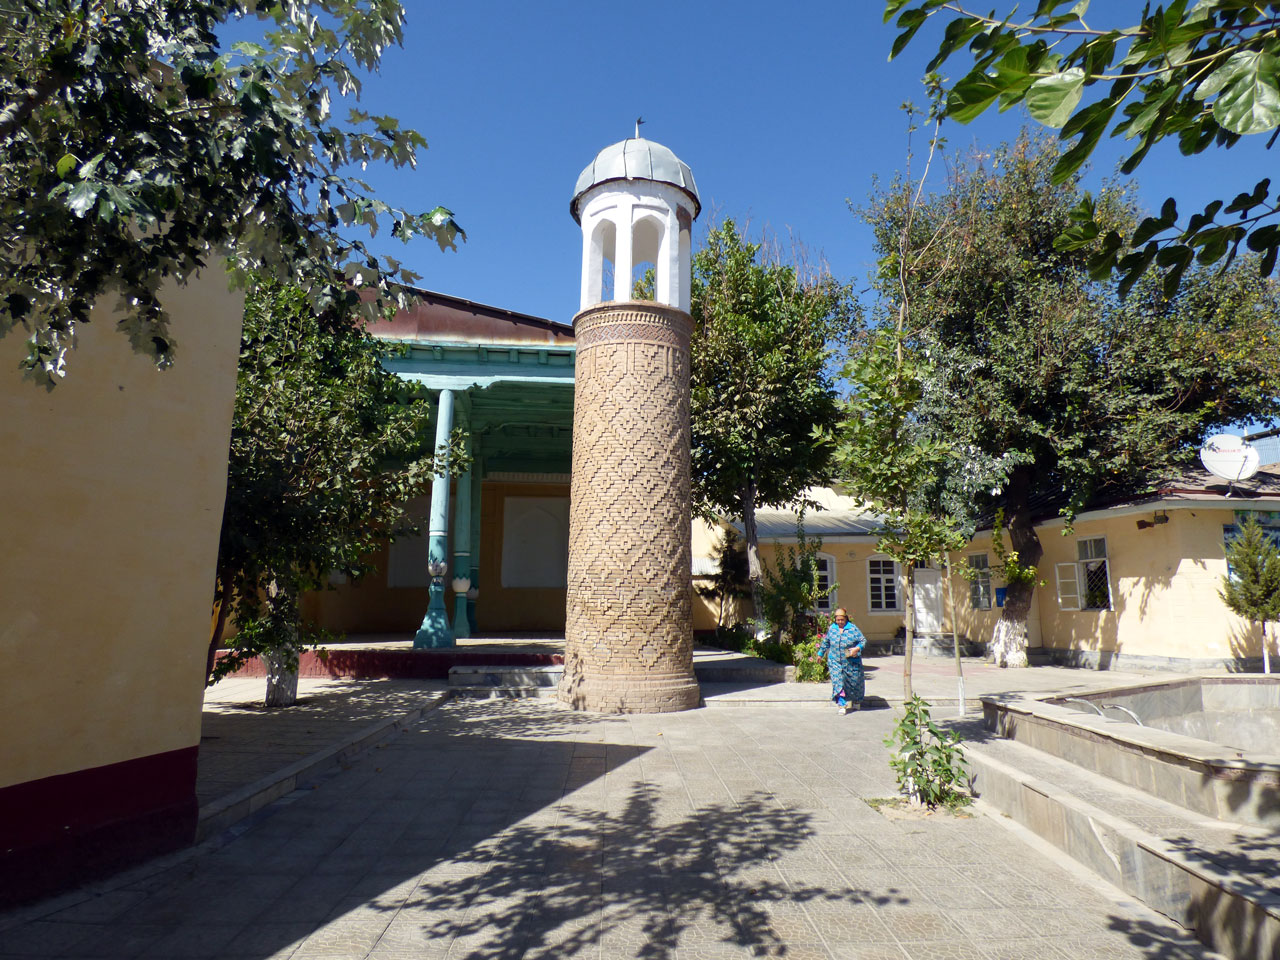 Mubarak mosque, Samarkand Old Town